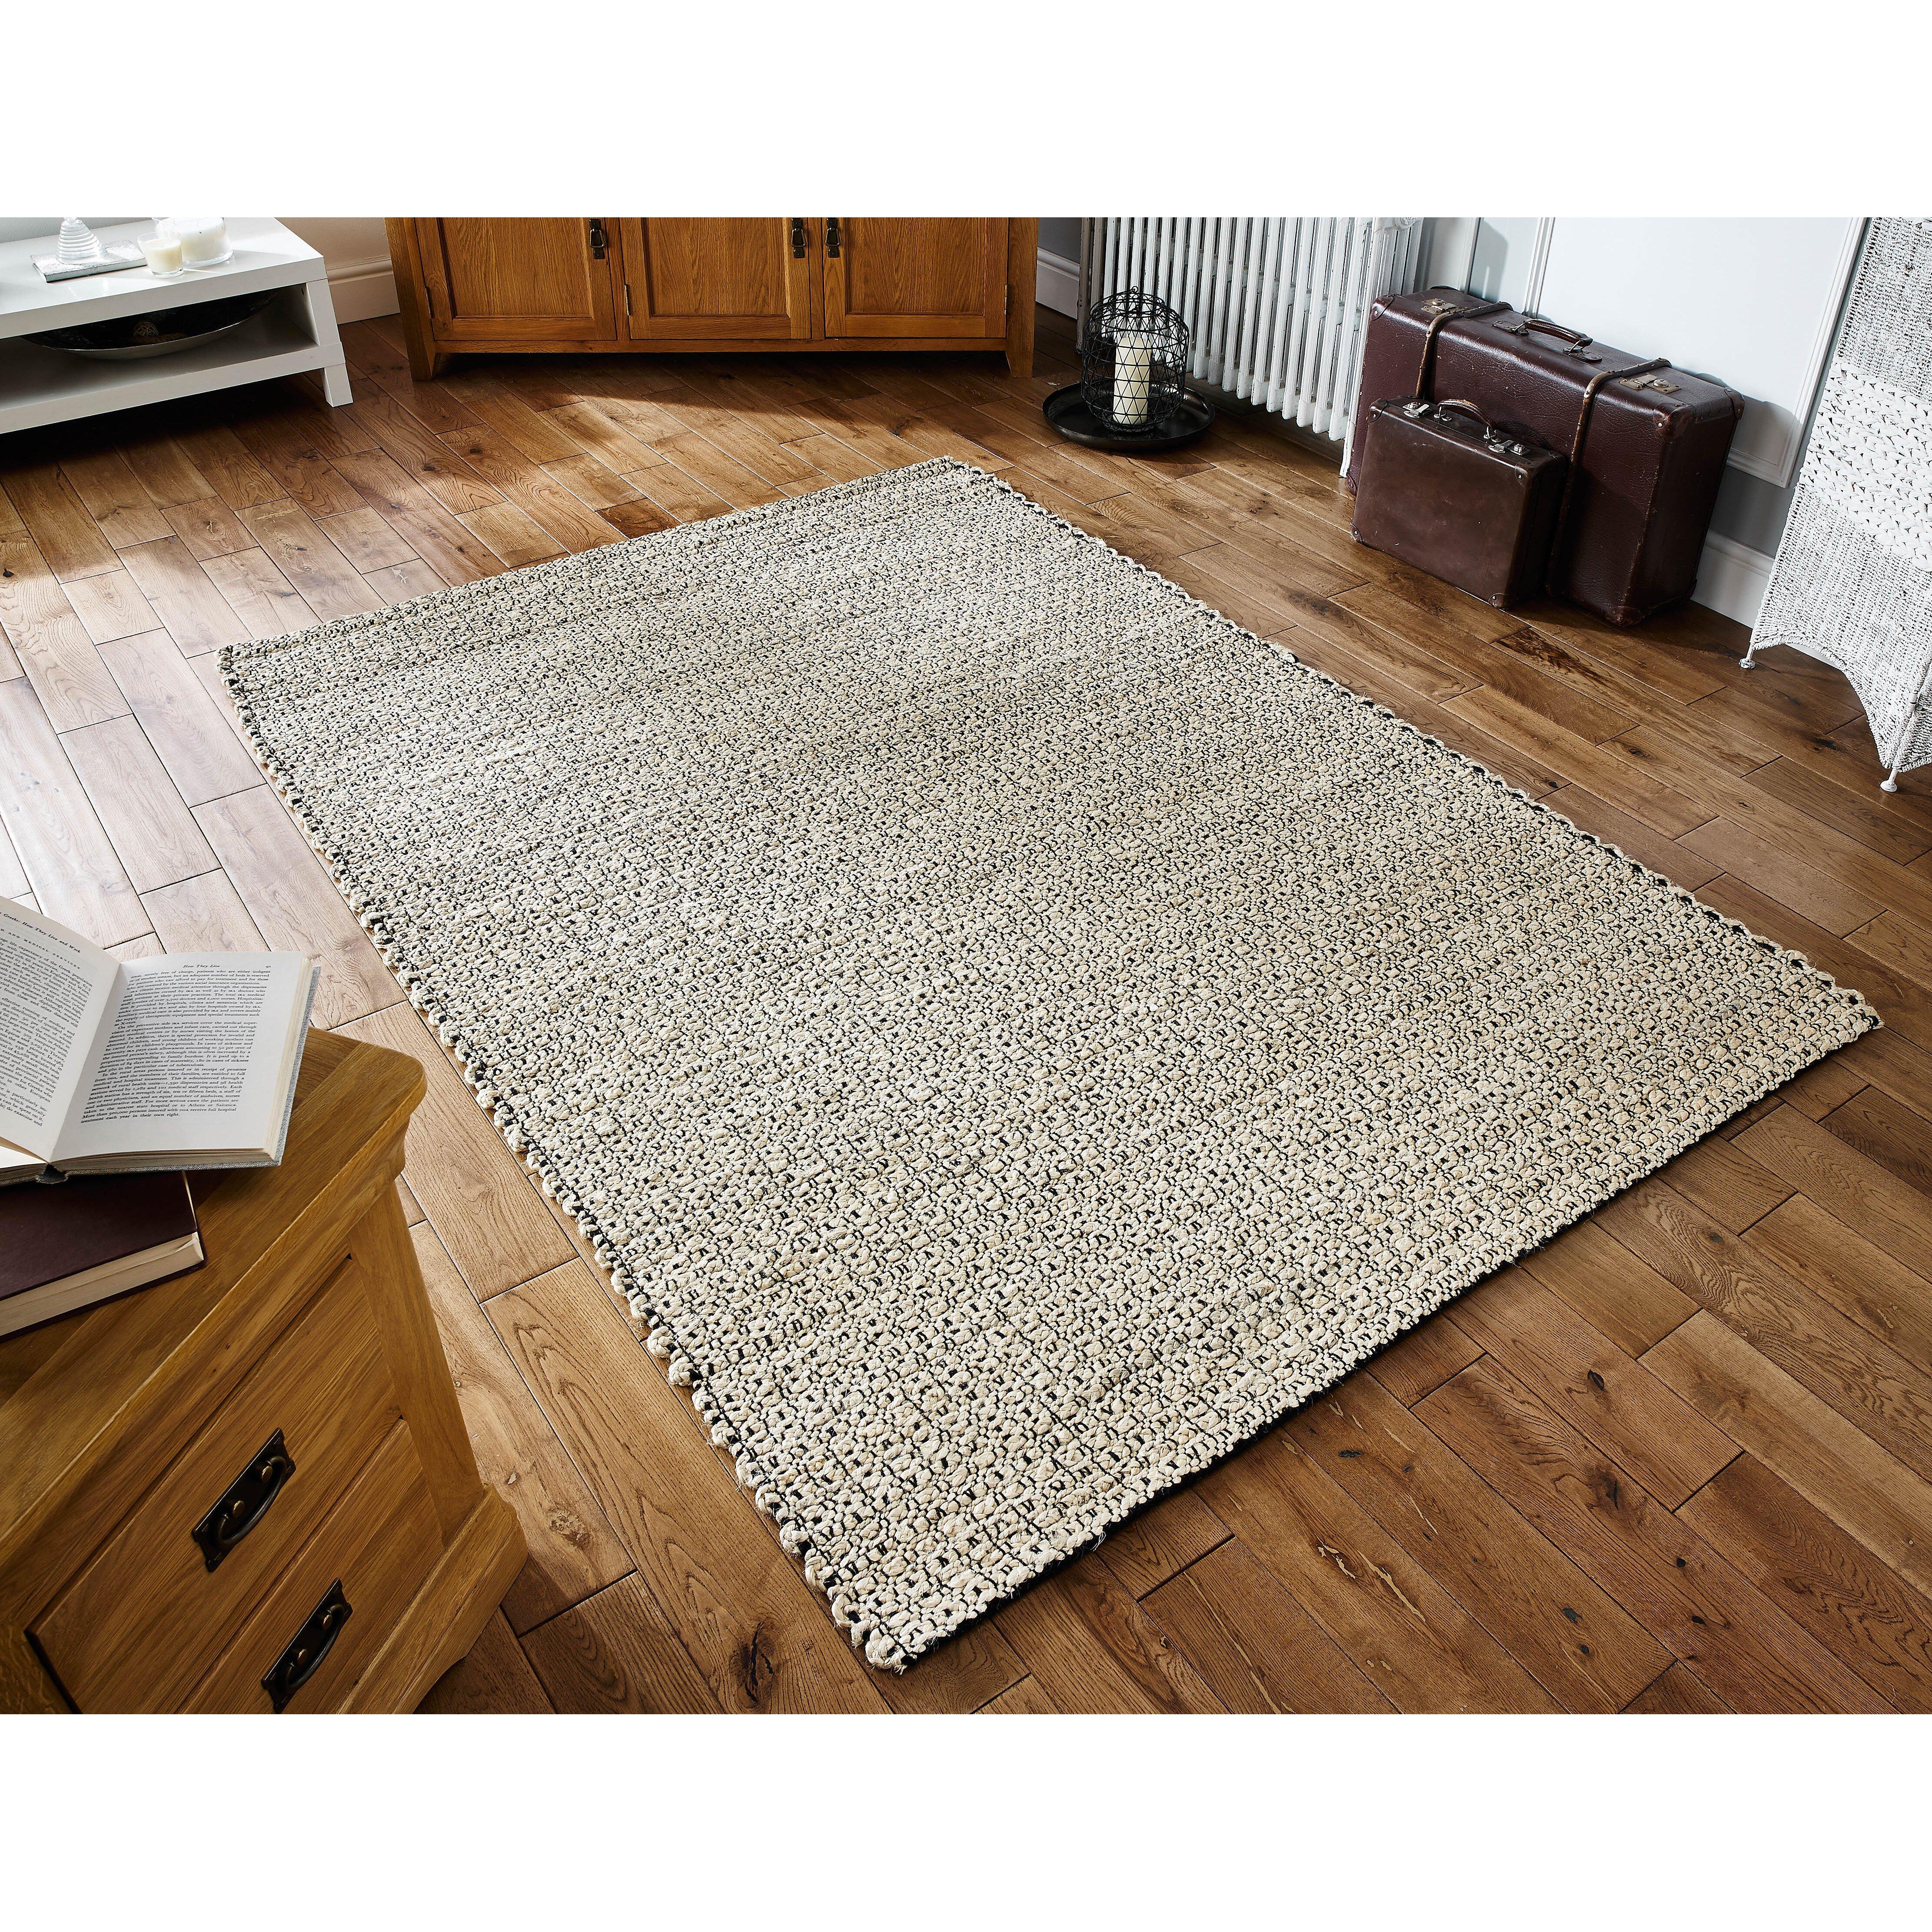 Oriental Weavers Handgewebter Teppich Oslo in Creme